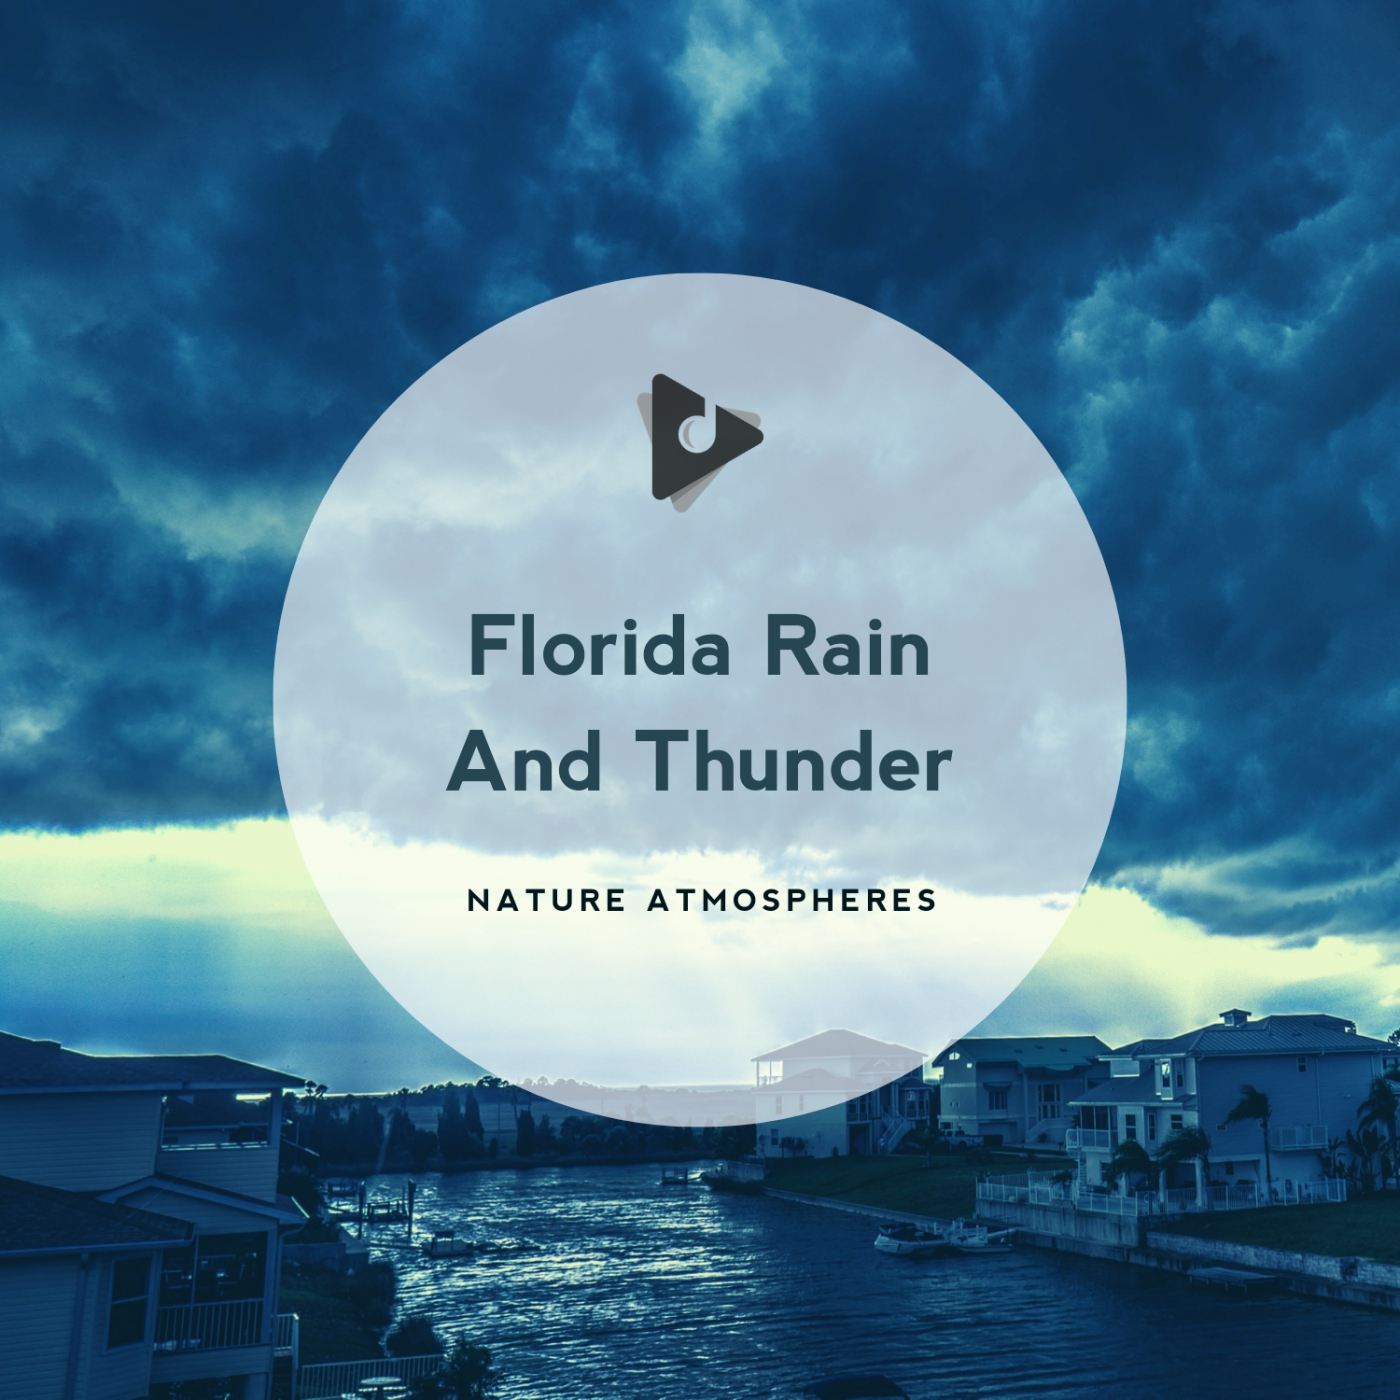 Florida Rain And Thunder